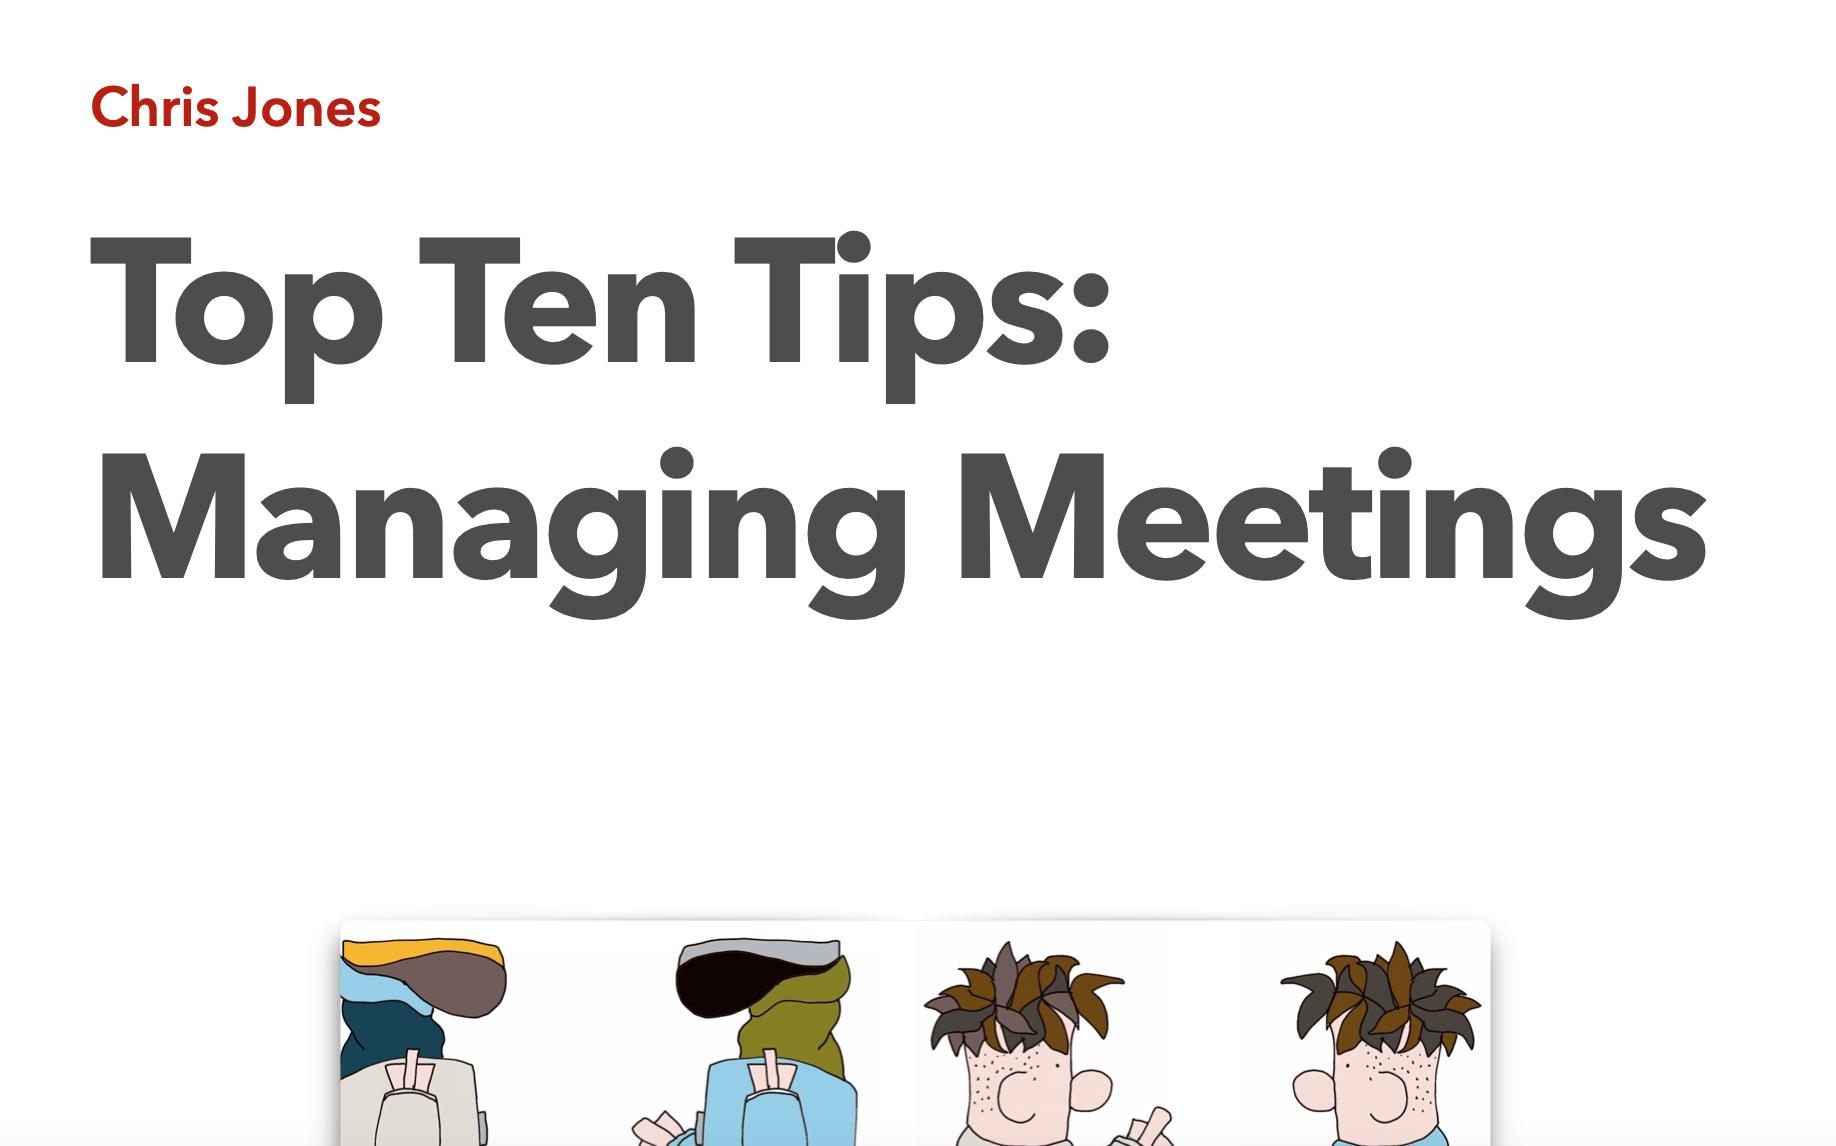 Top Ten Tips: Managing Meetings